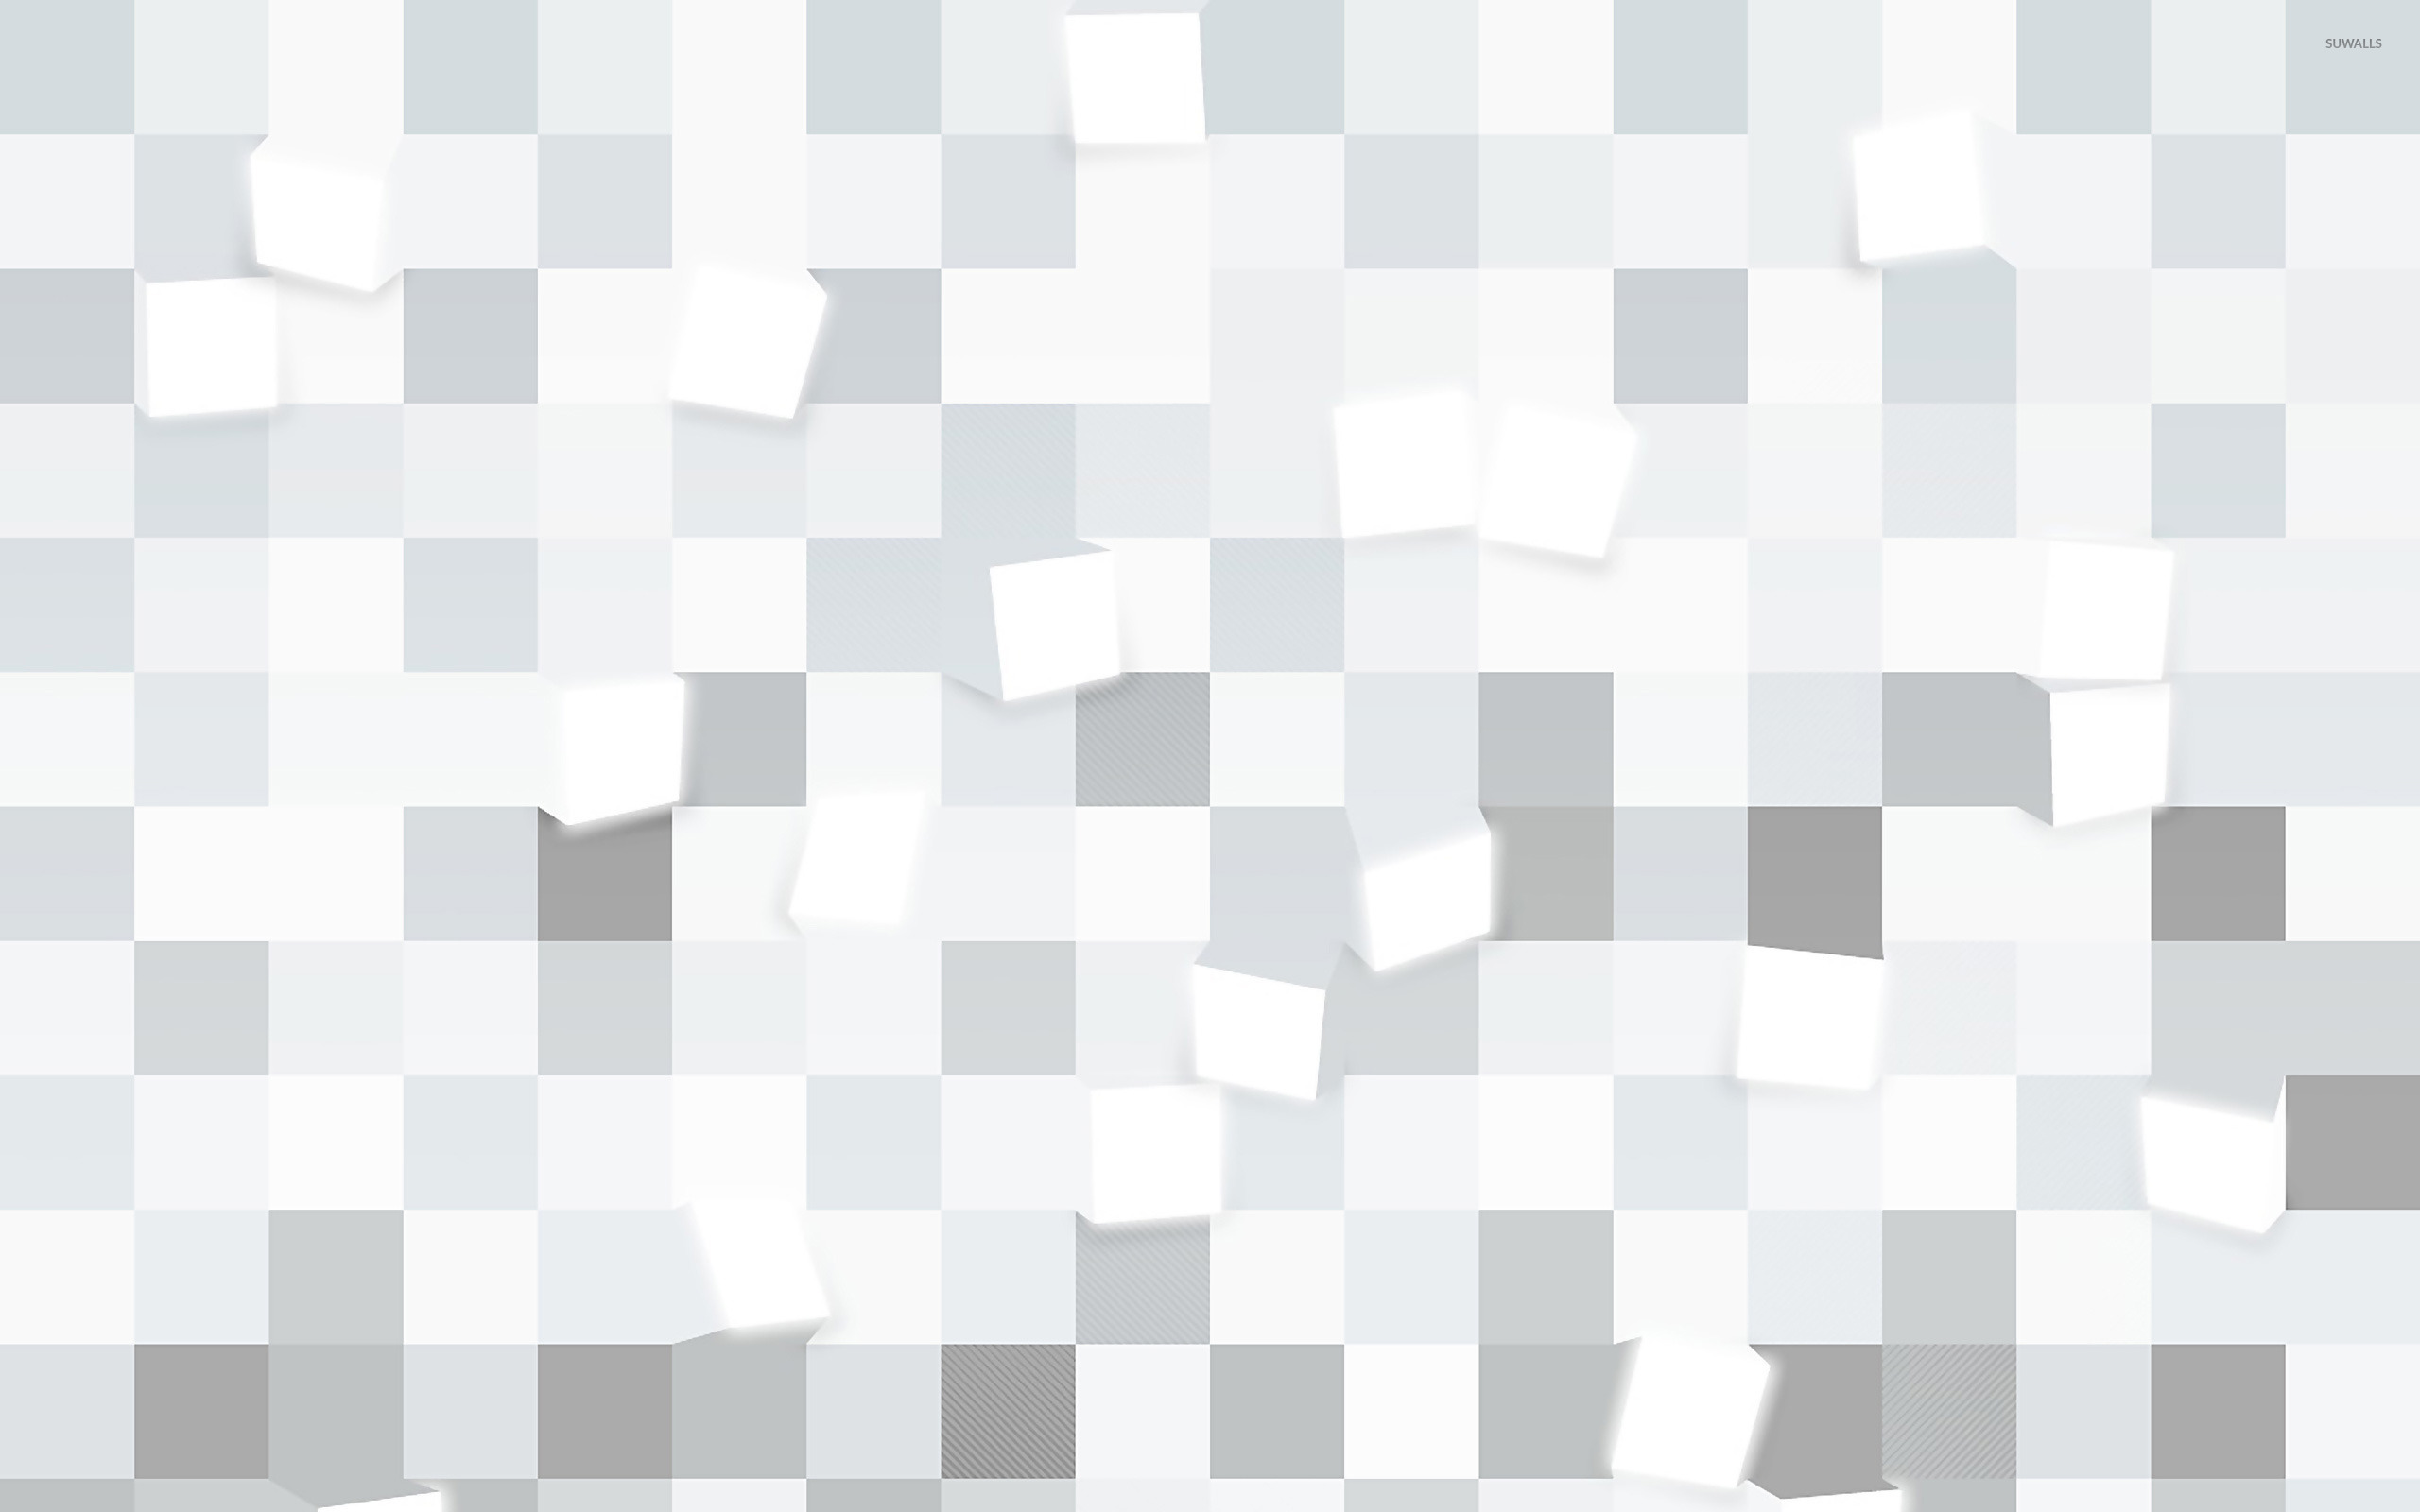 Glowing gray cubes wallpaper 3d wallpapers 25156 for Grey 3d wallpaper